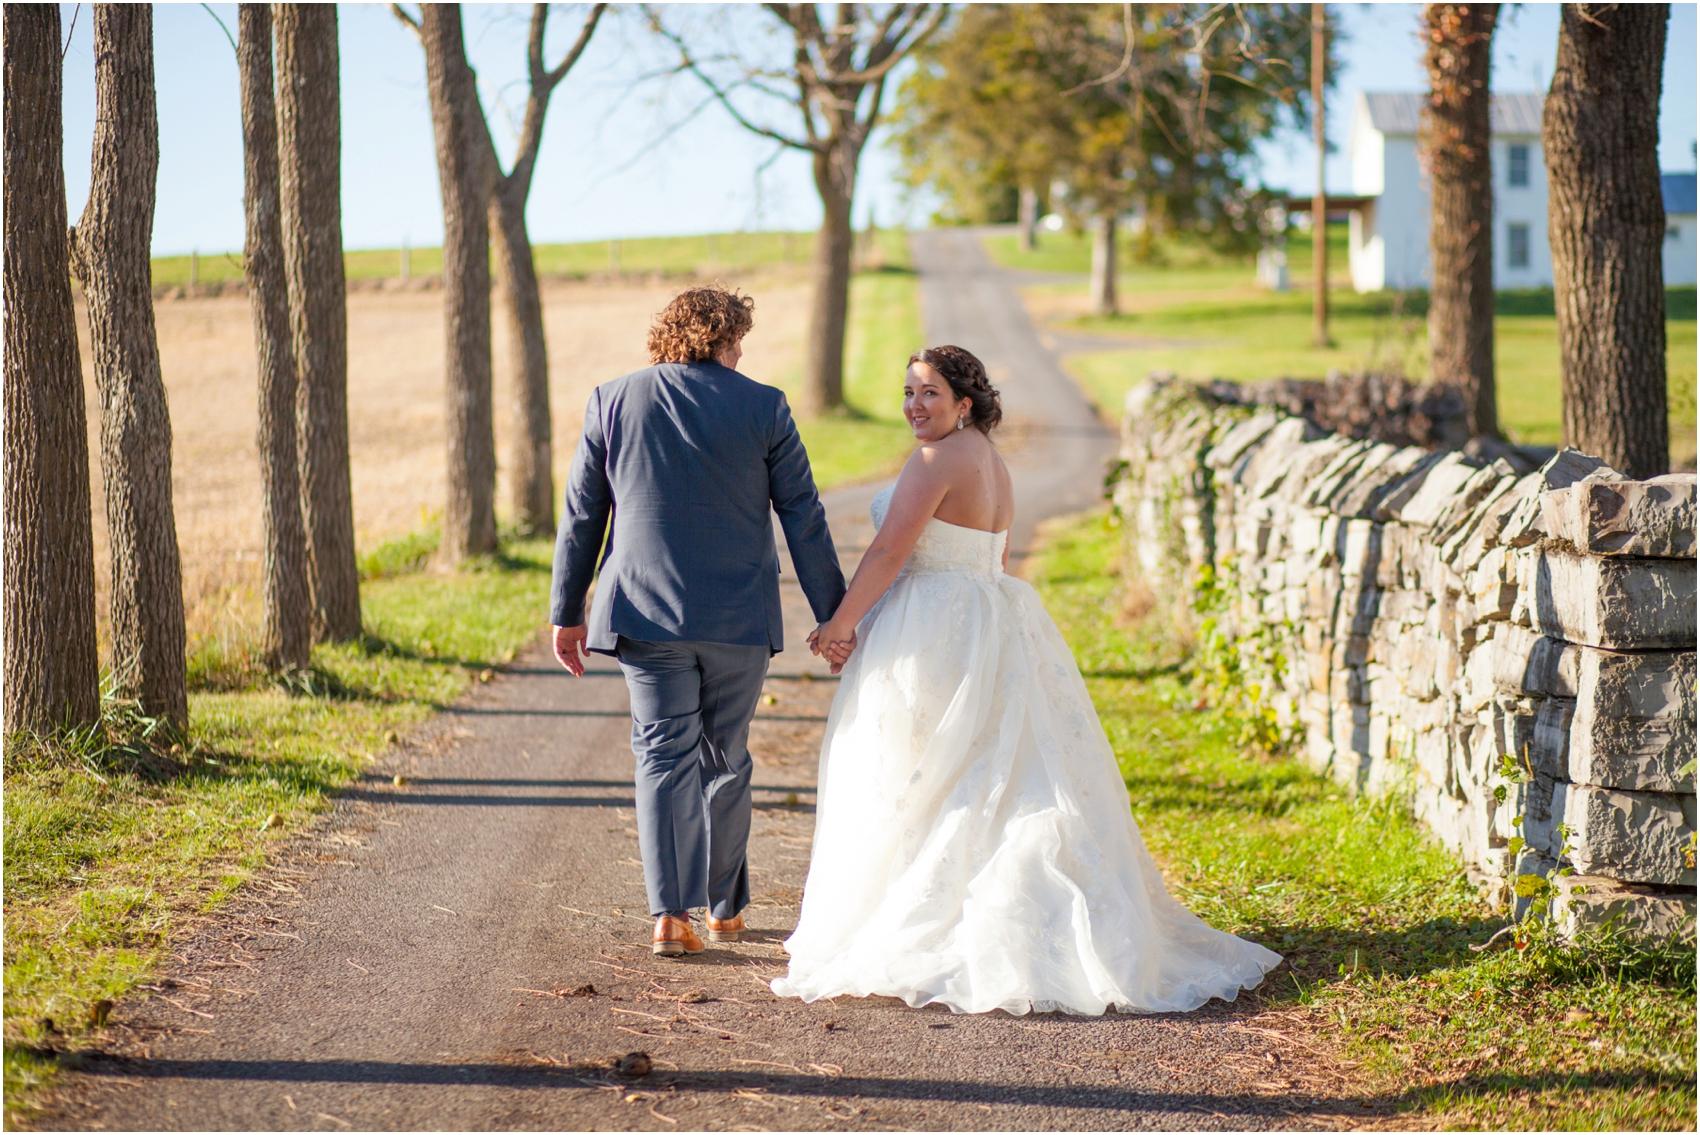 On-Sunny-Slope-Farm-Fall-Virginia-Wedding-3034.jpg